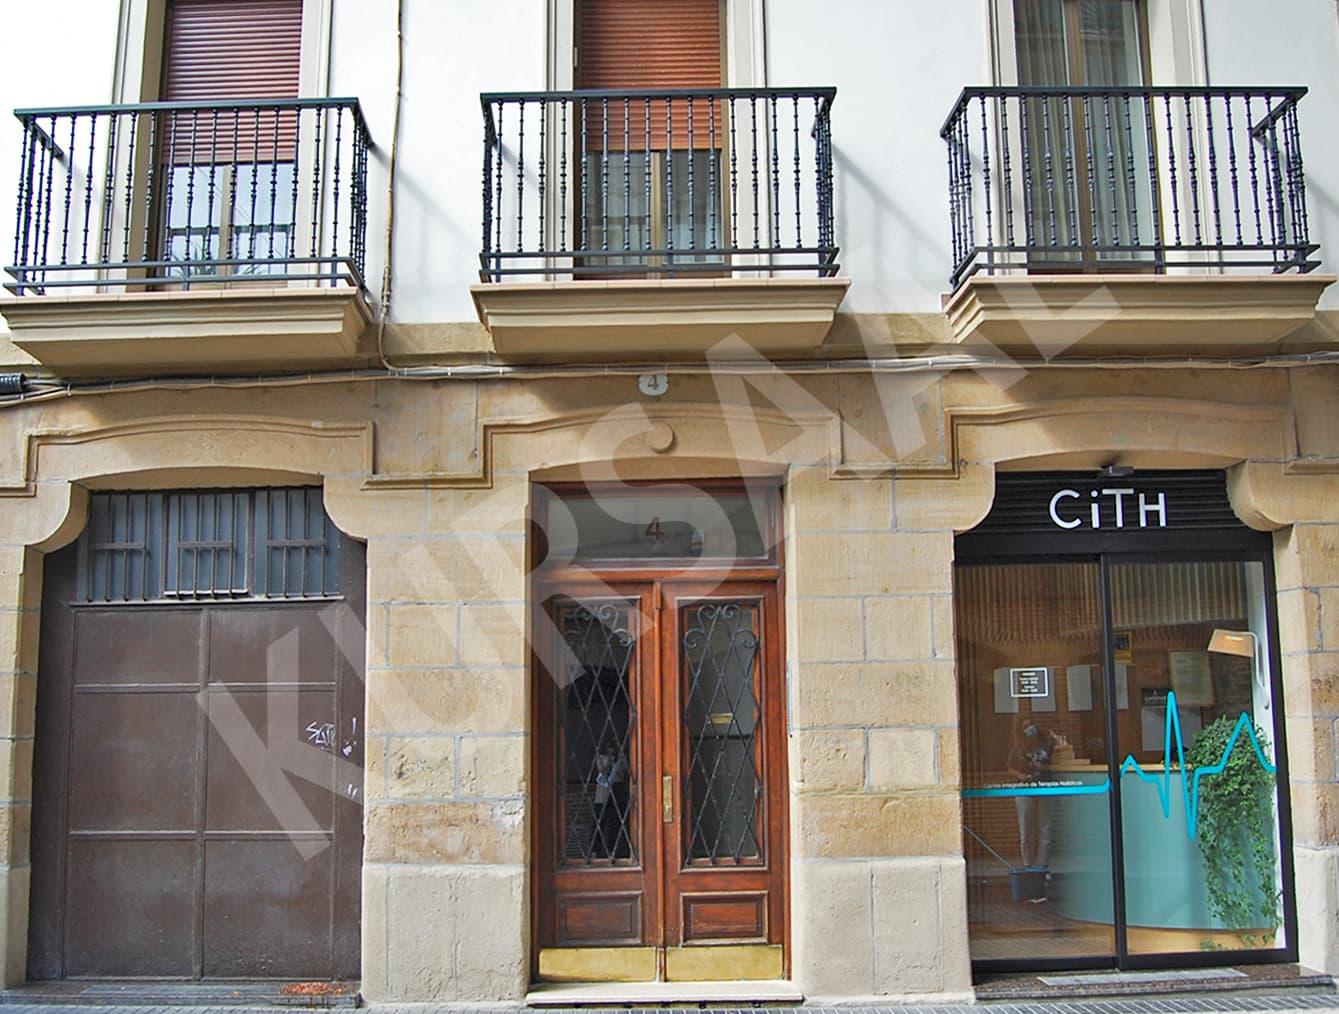 foto 10 - Restauración y patrimonio-Huertas, 4-DONOSTIA, GIPUZKOA